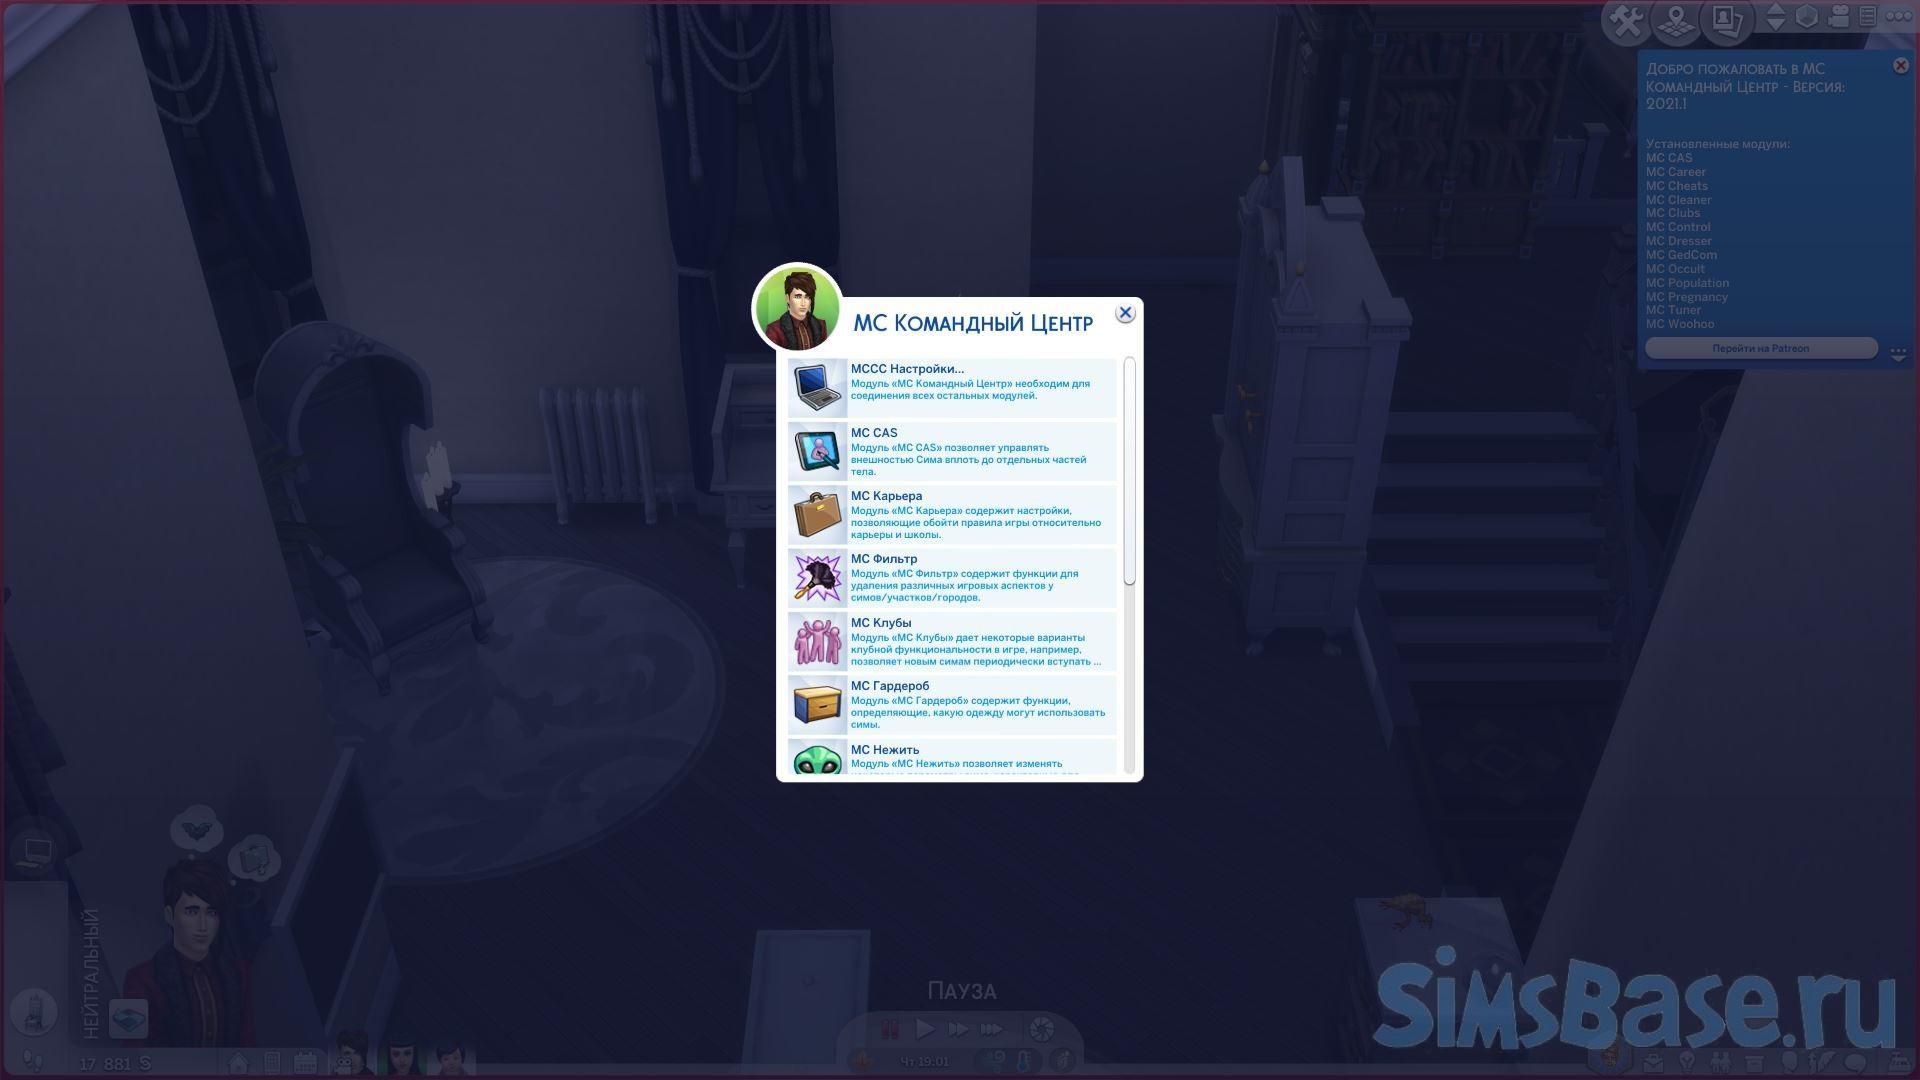 Мод «MC Command Center или Командный центр v. 2021.1» от deaderpool для Sims 4